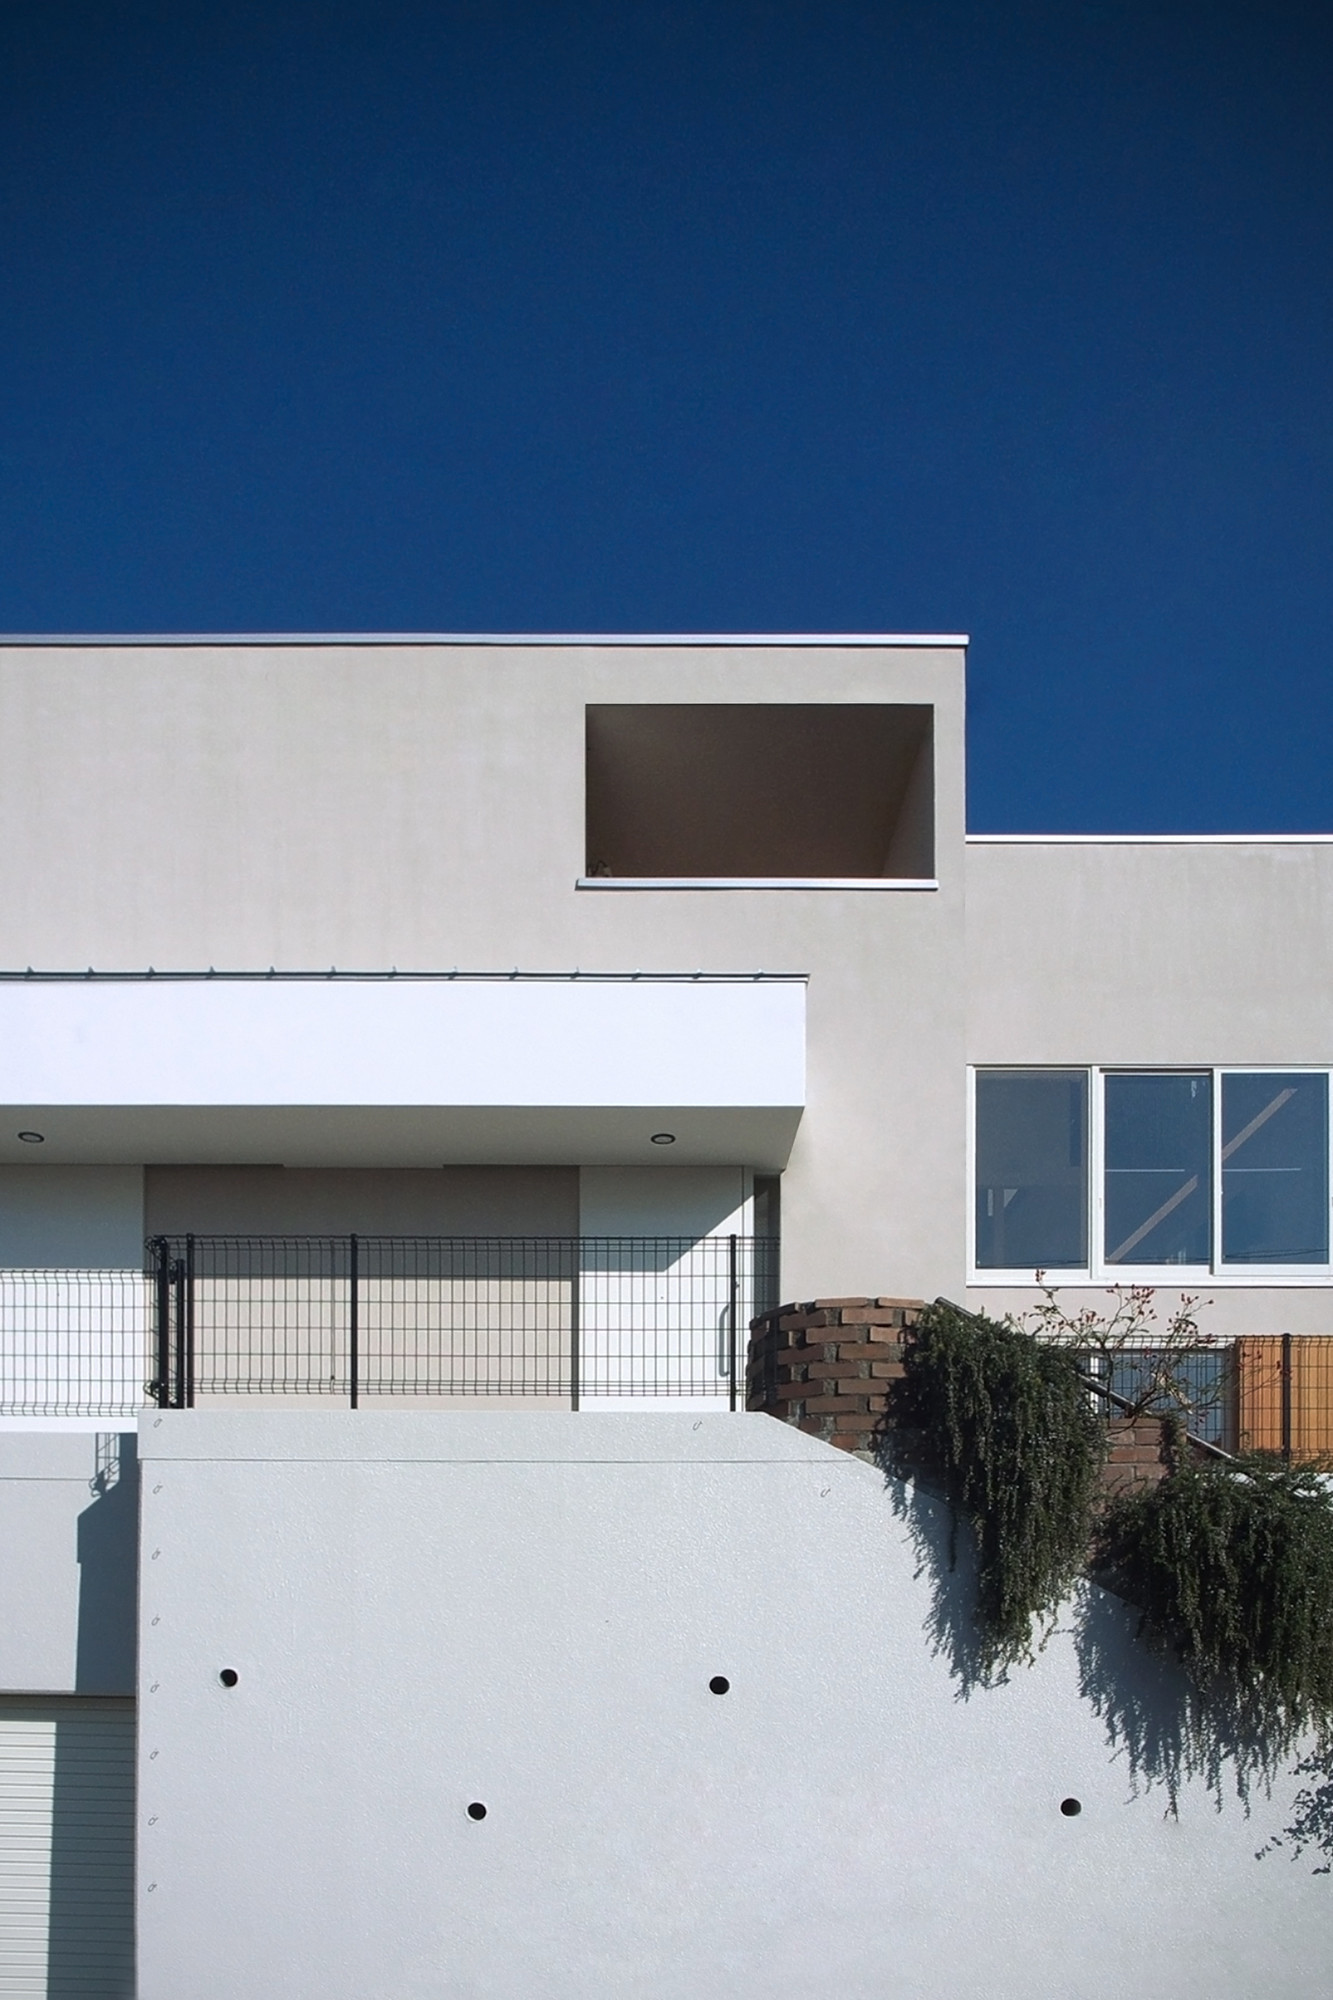 kirigaokaの建築事例写真